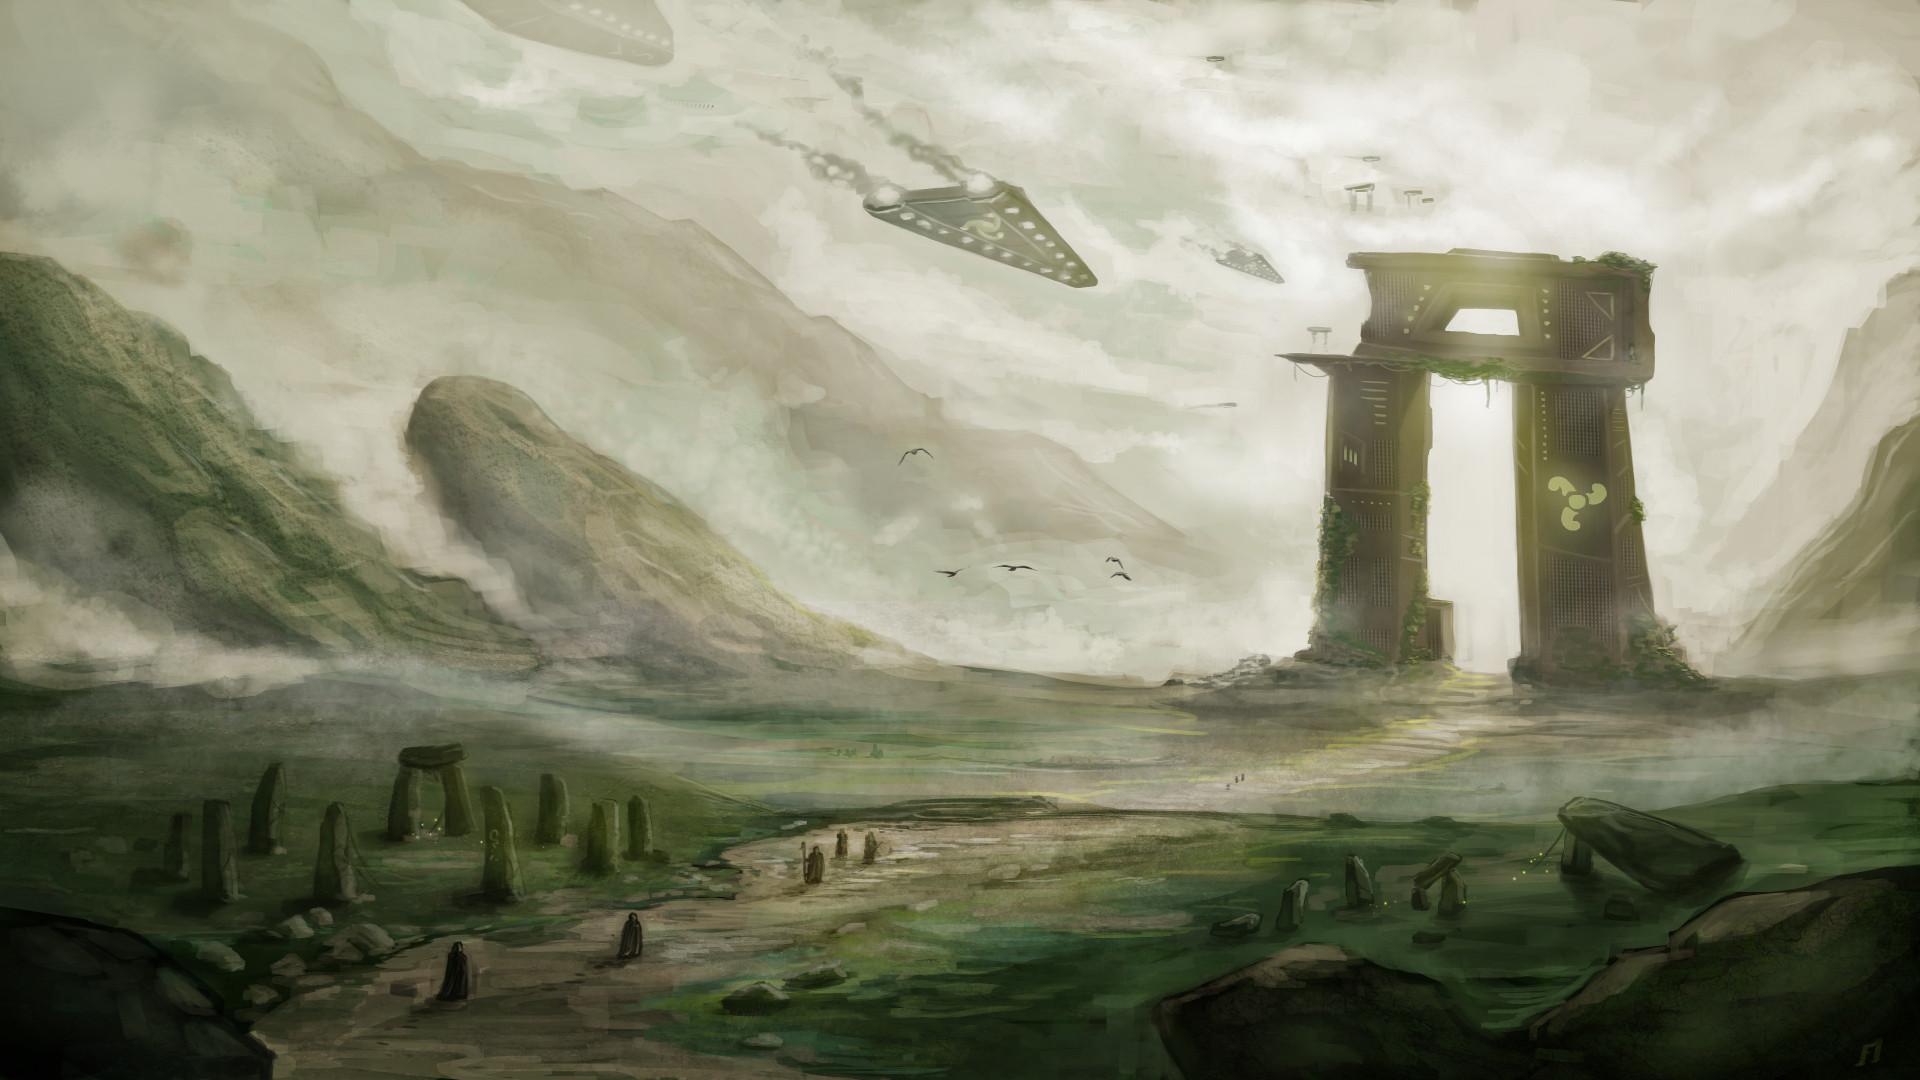 Celtic Sci-Fi by Matou31